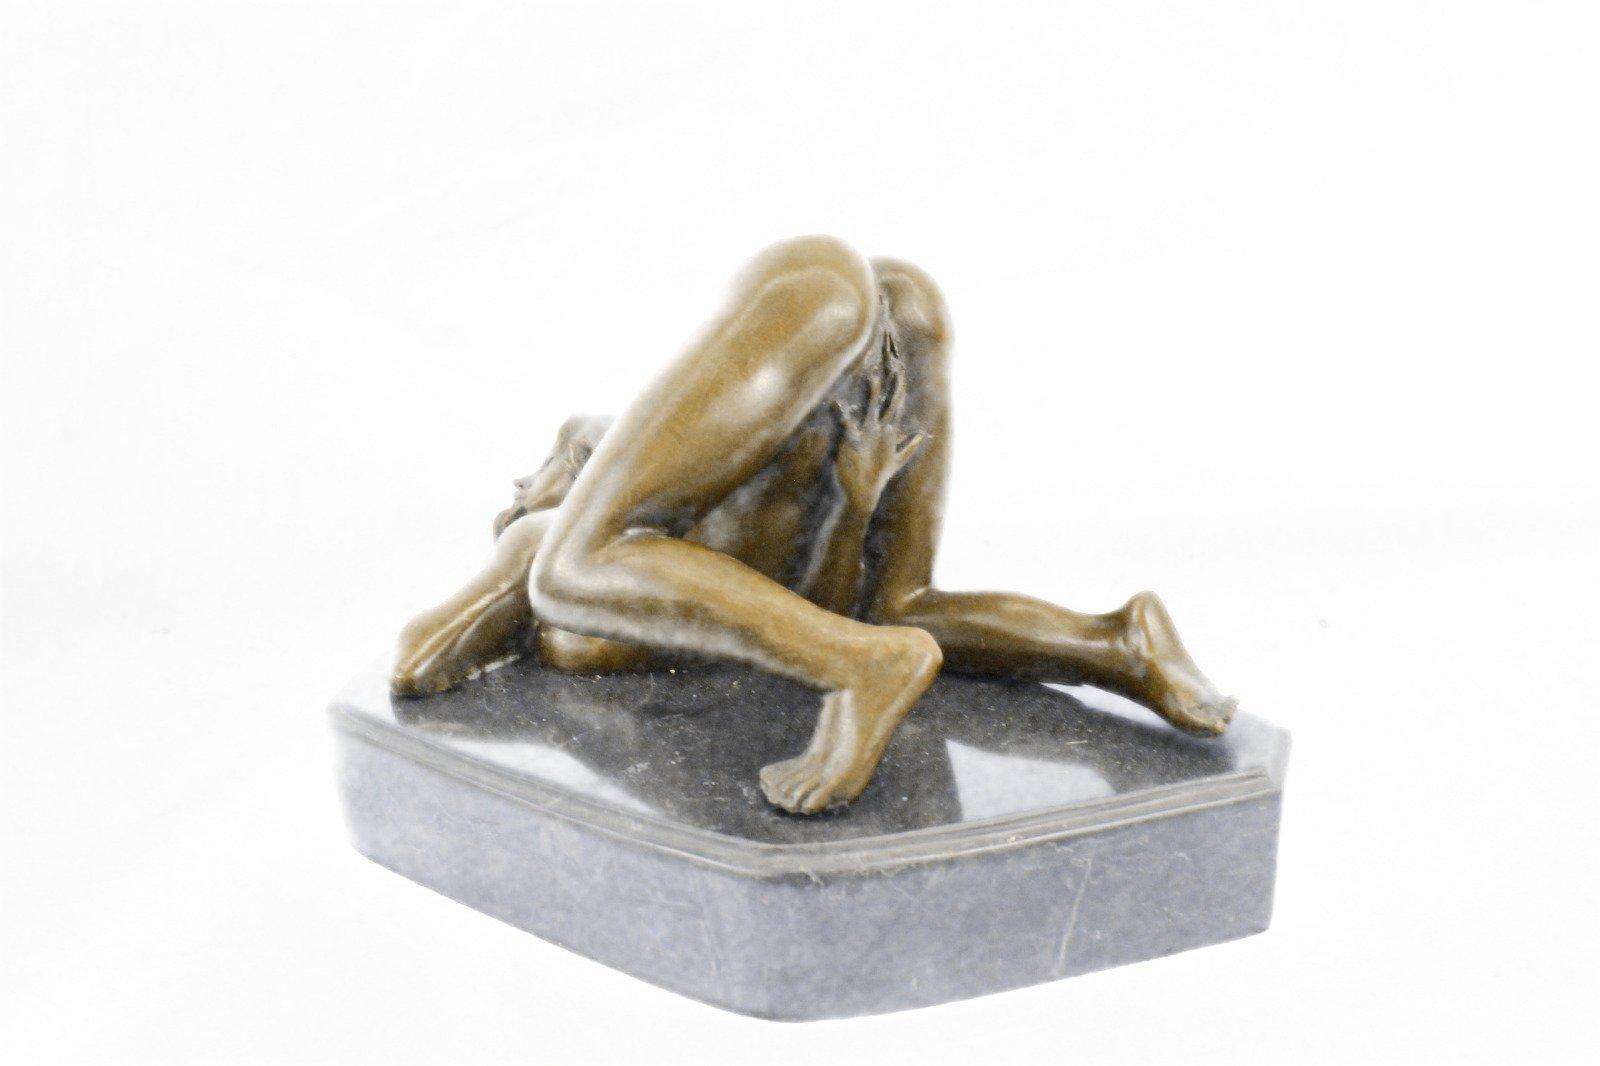 Amazon.com: Toro Handmade European Bronze Sculpture Art